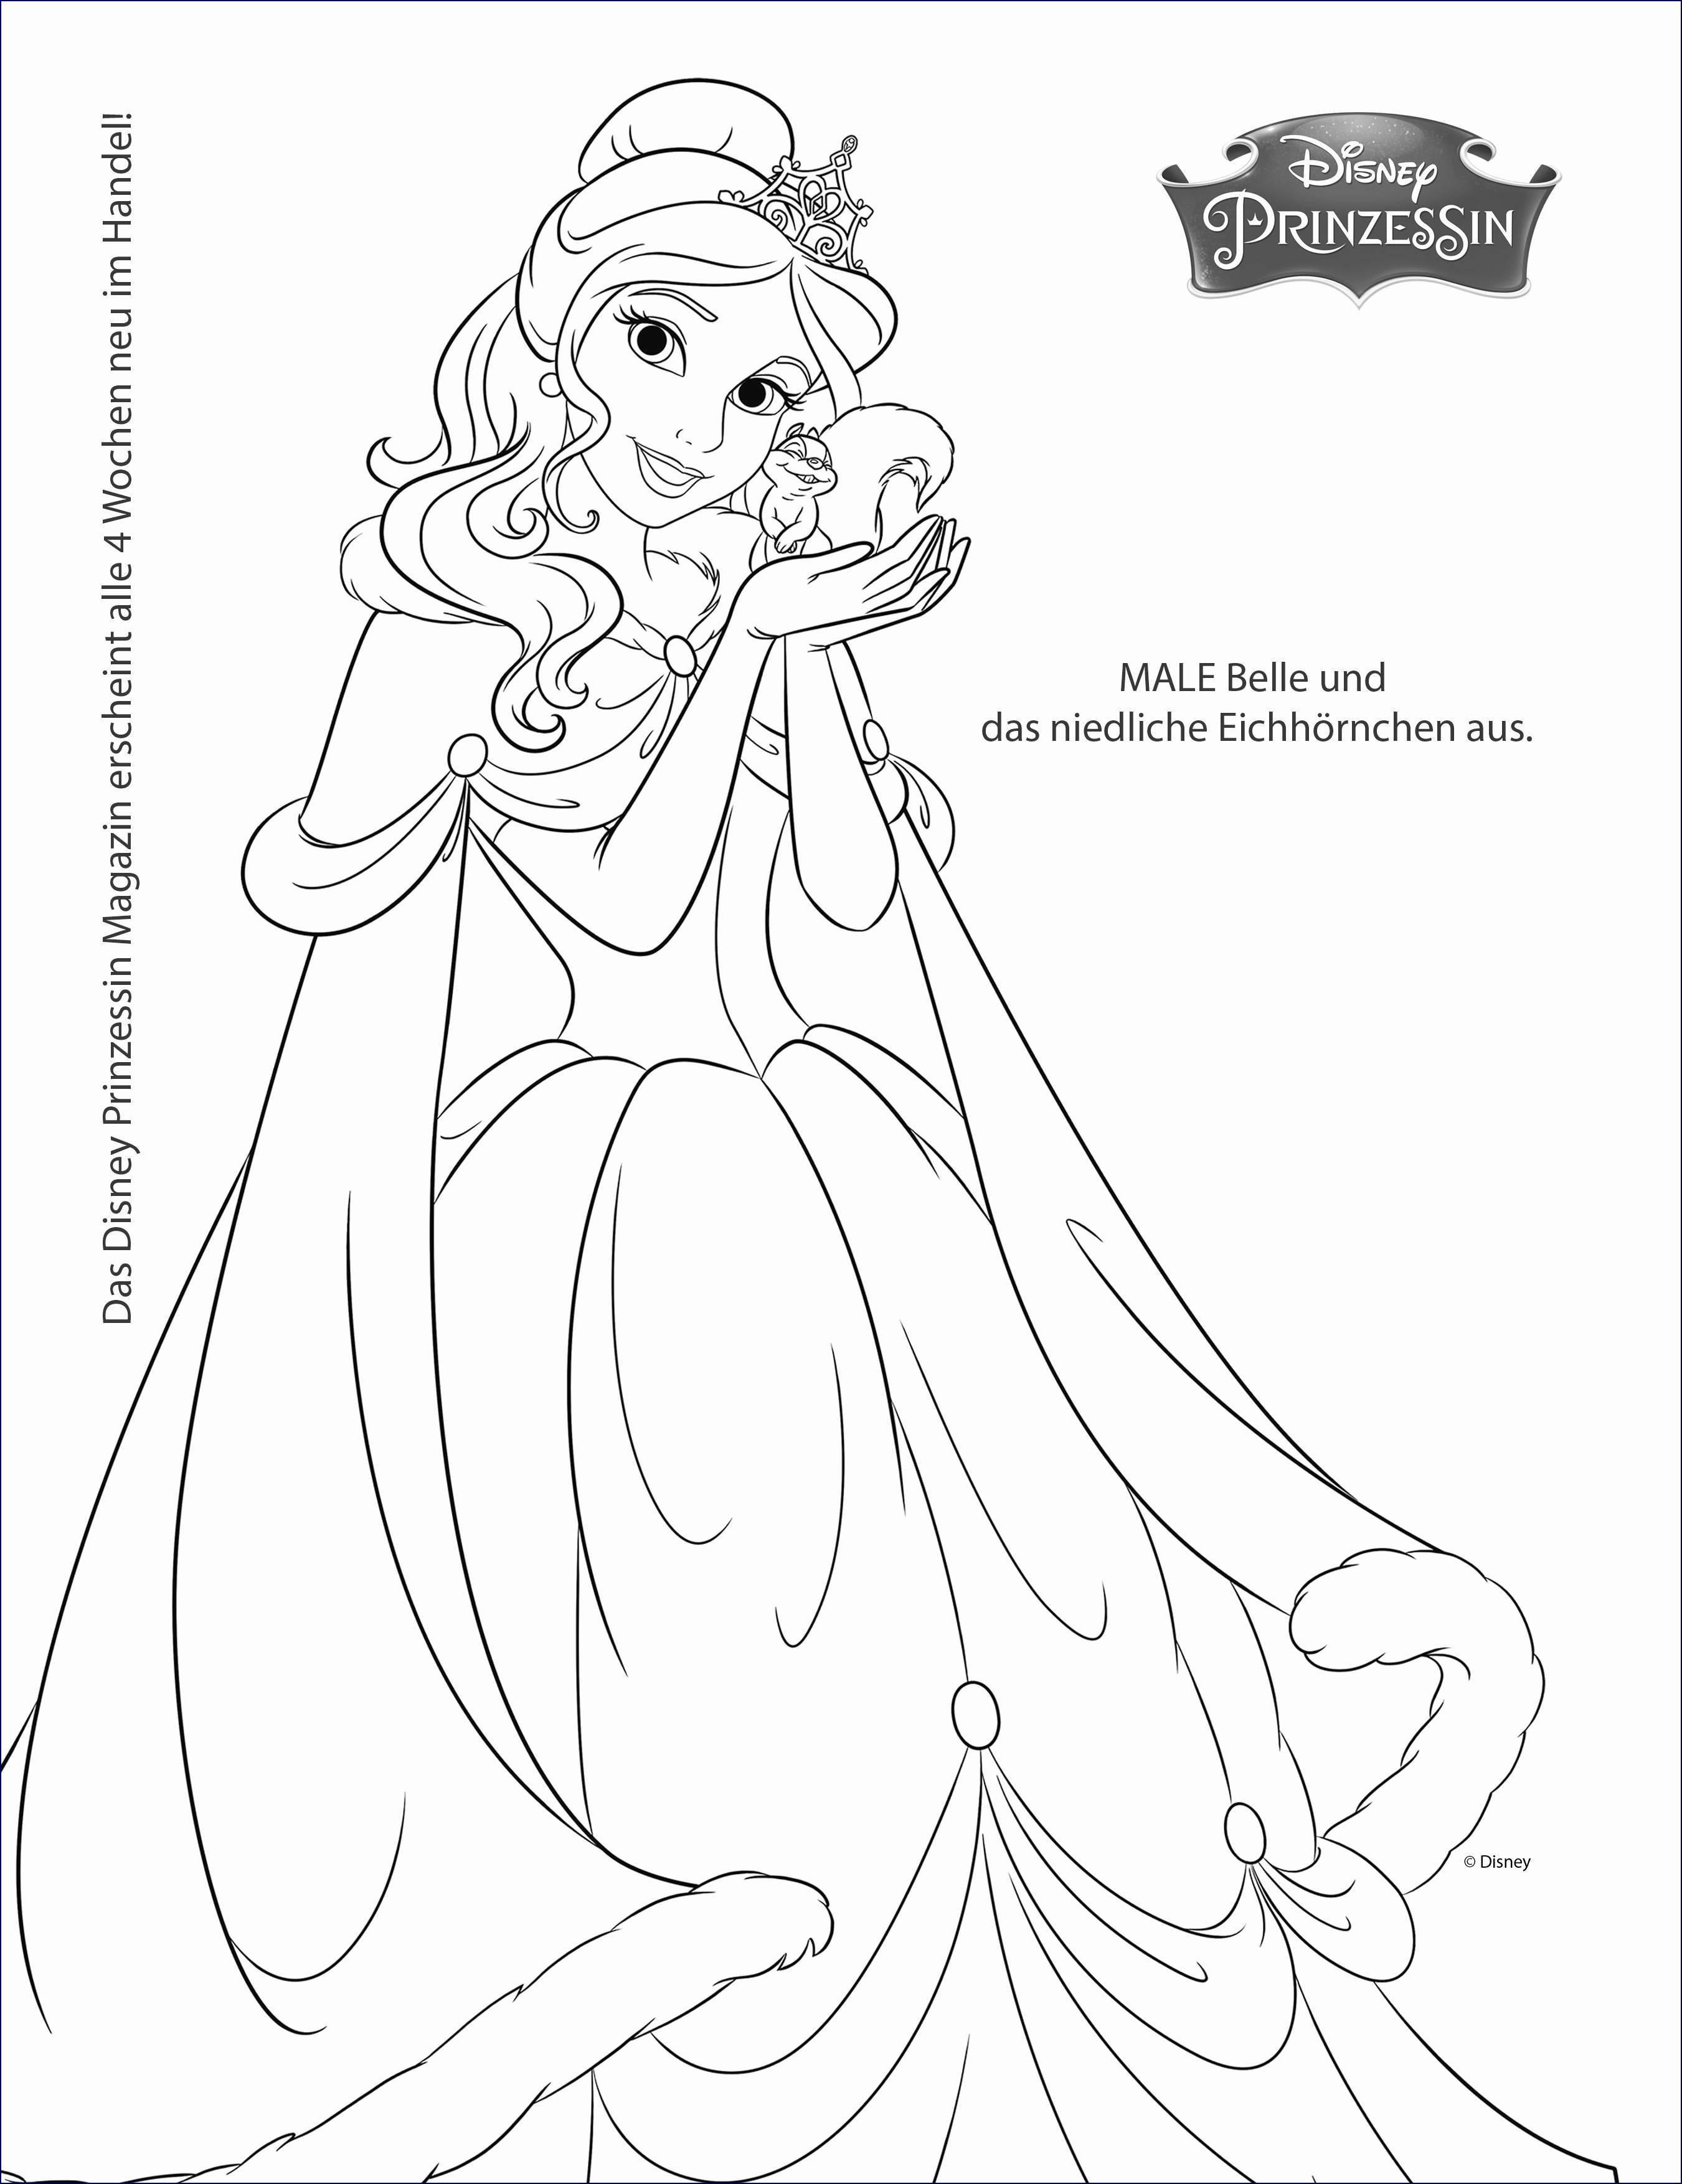 Malvorlagen Caillou Genial Abcpics – Page 8 Xtd6 Stock